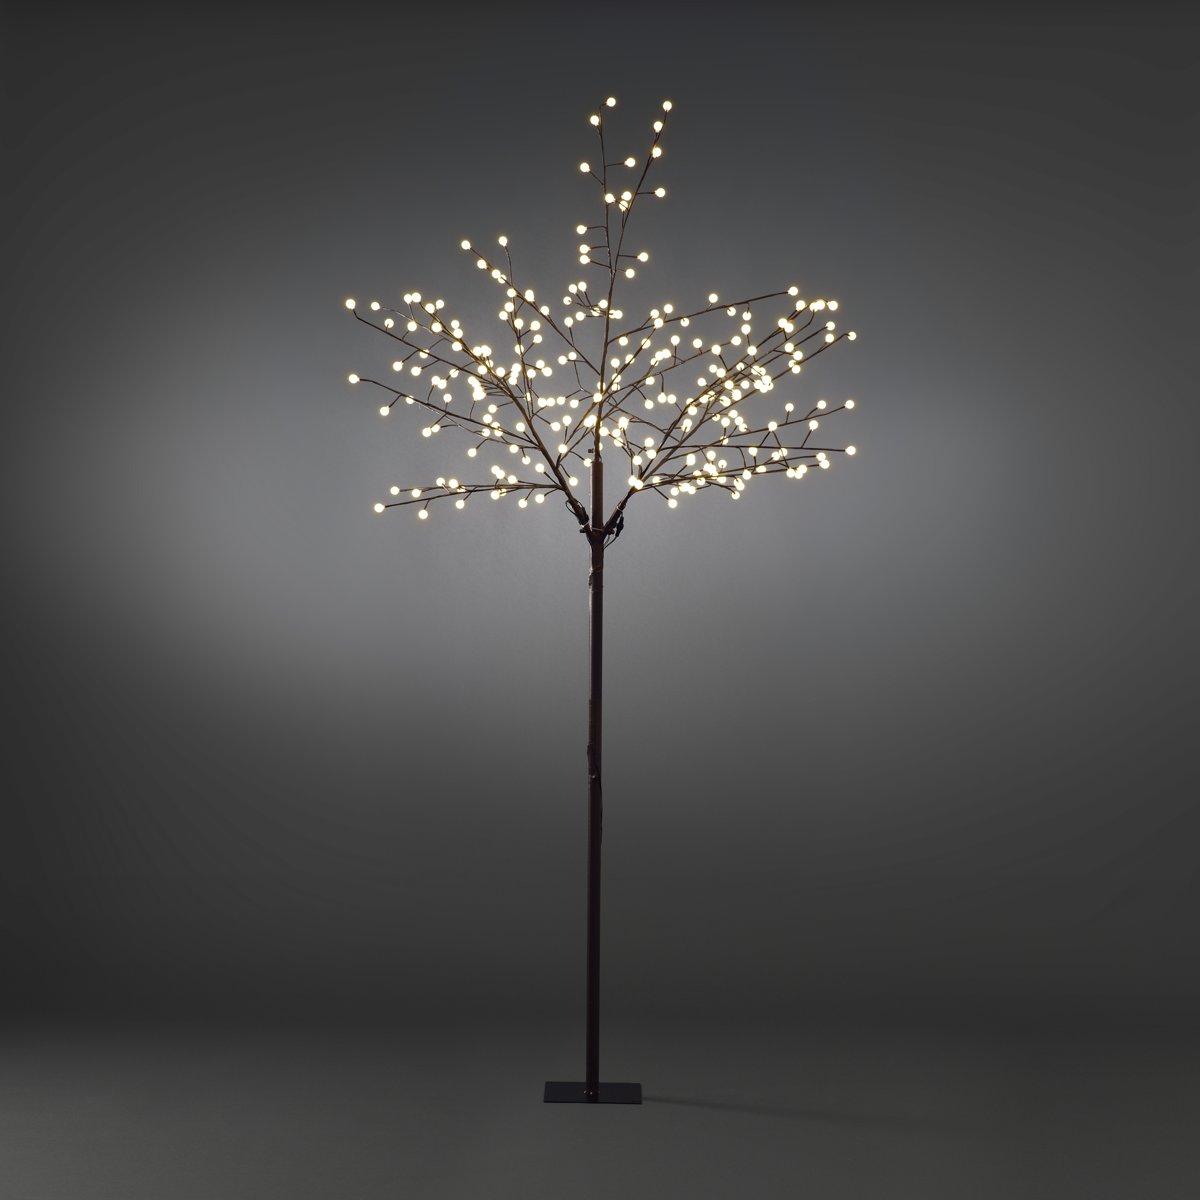 Konstsmide - LED boom bruin 250cm 24V 240x - warmwit kopen